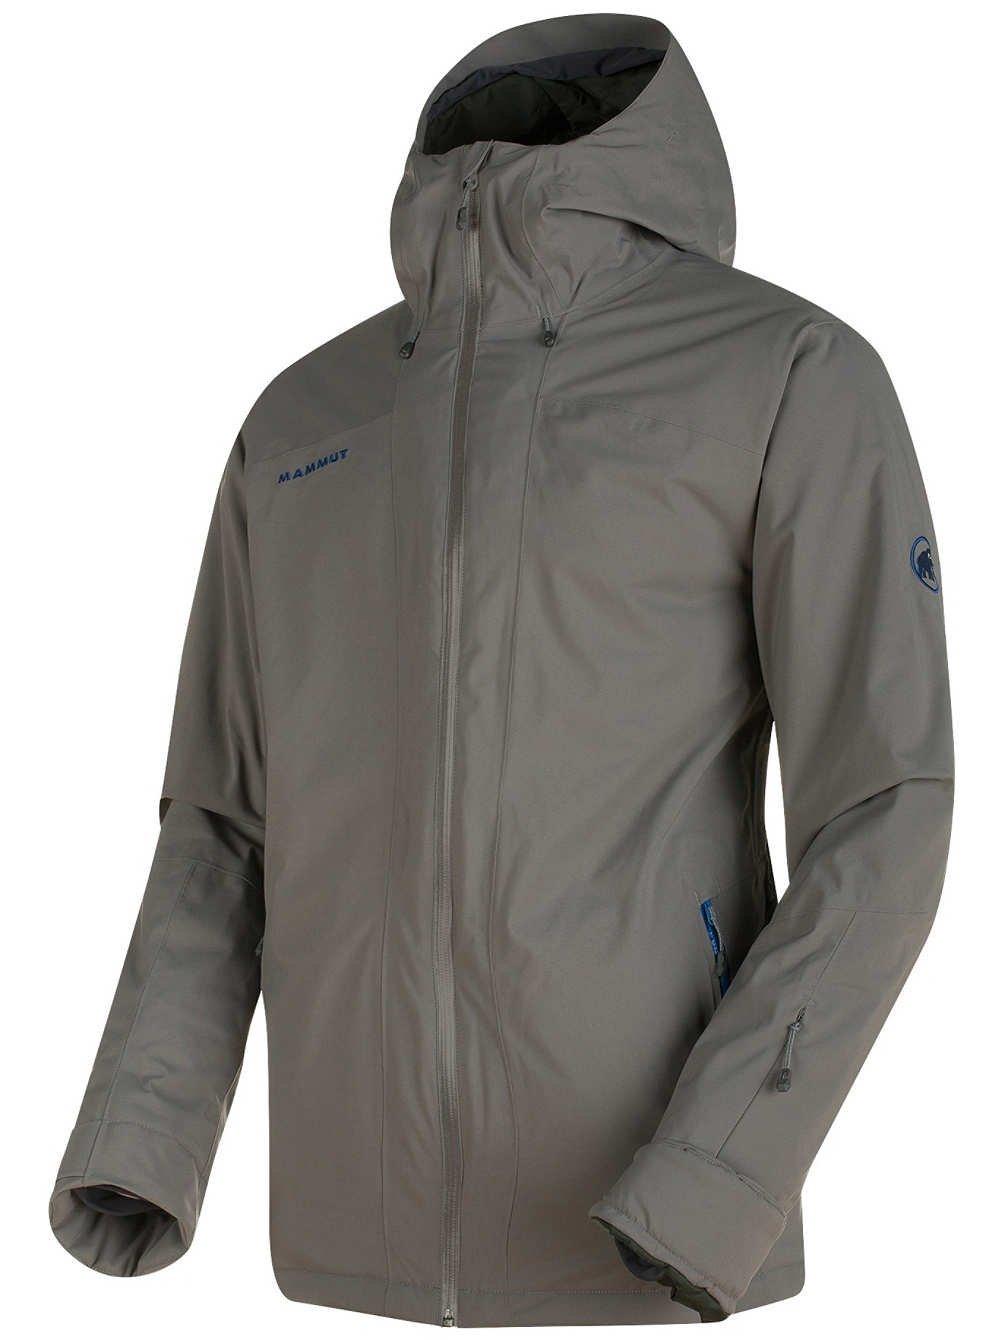 Mammut Andalo HS Thermo Hooded Jacket B071GD1FQW Large|titanium titanium Large